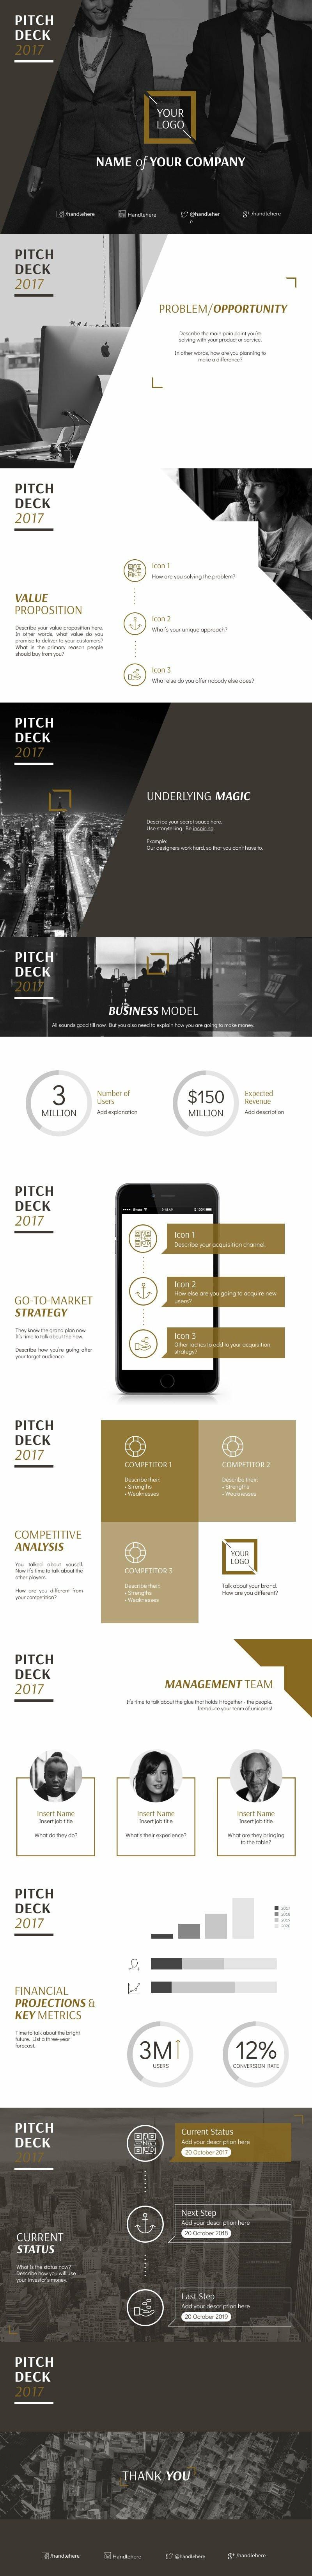 Business Pitch Deck